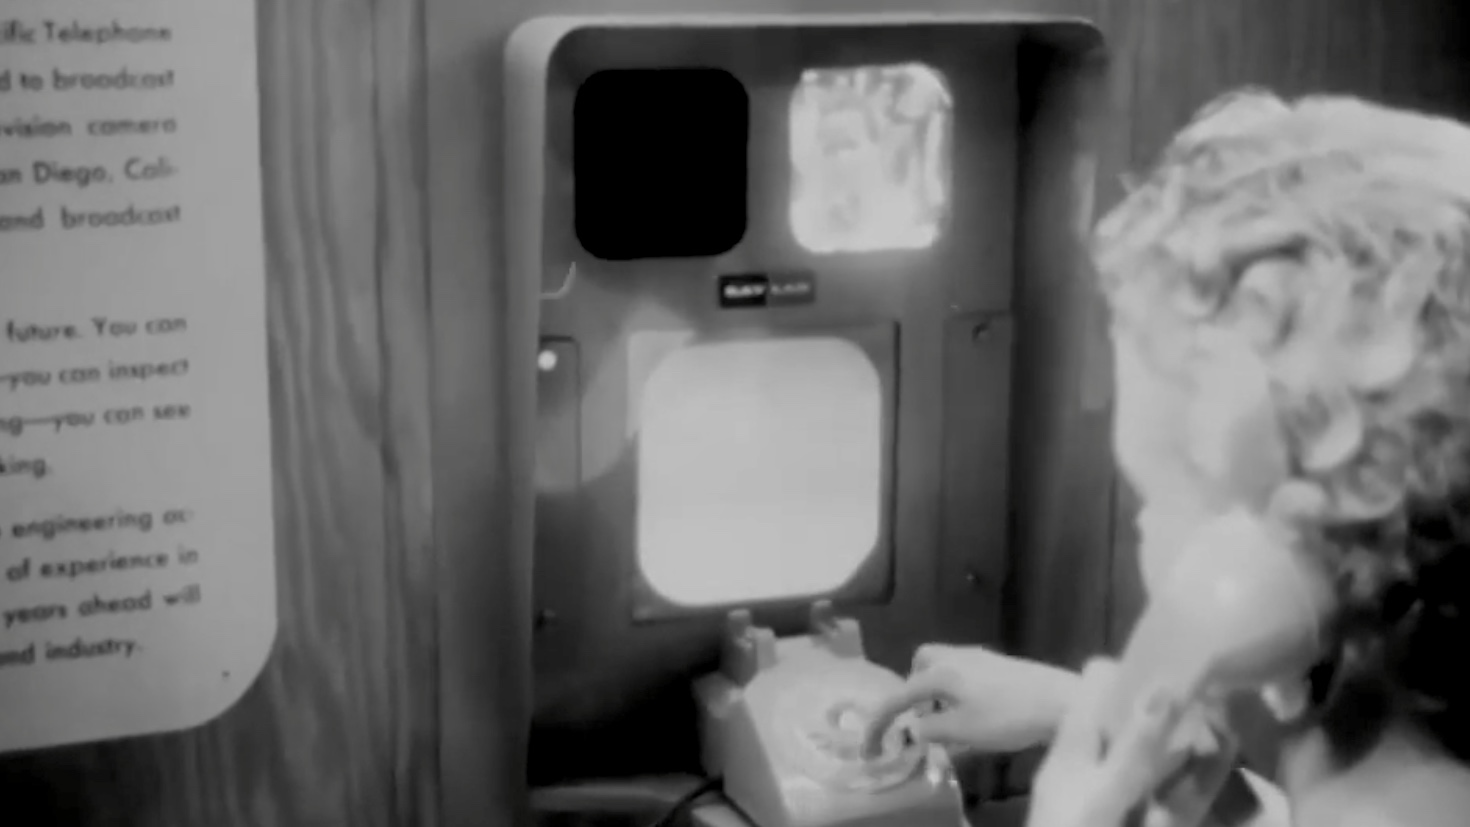 primul videotelefon